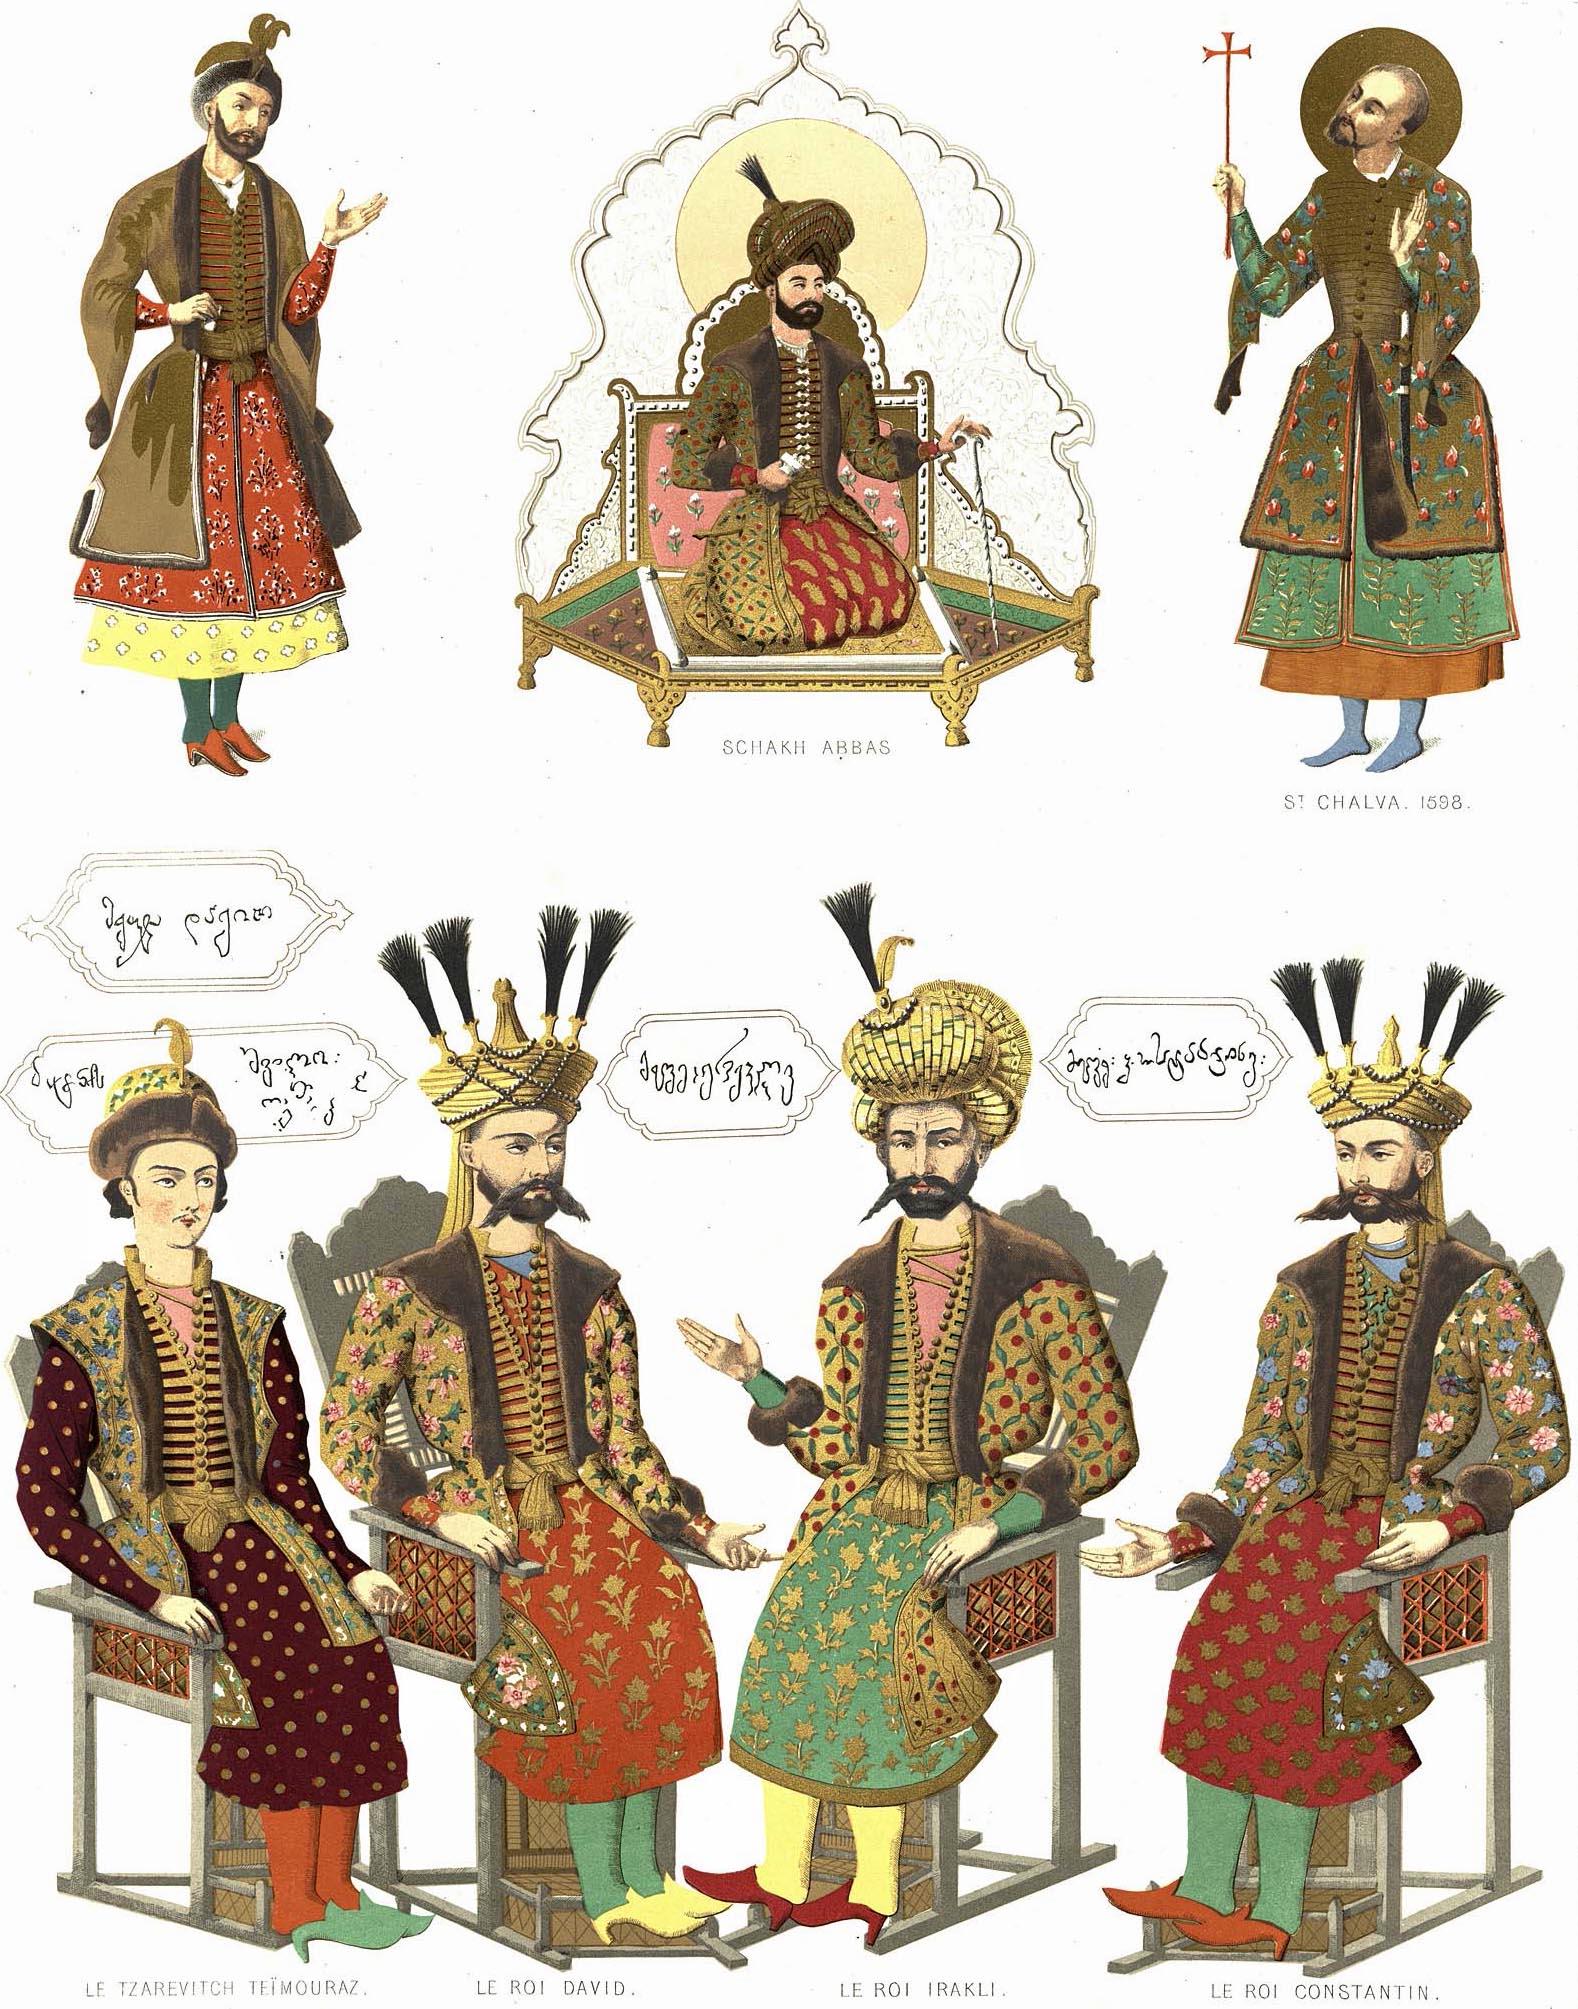 59. Georgie au XVI siecle. St.Chalva et 4 rois georgiens / Грузия в XVI столетии. Святой Савва (?) и 4 грузинских царя